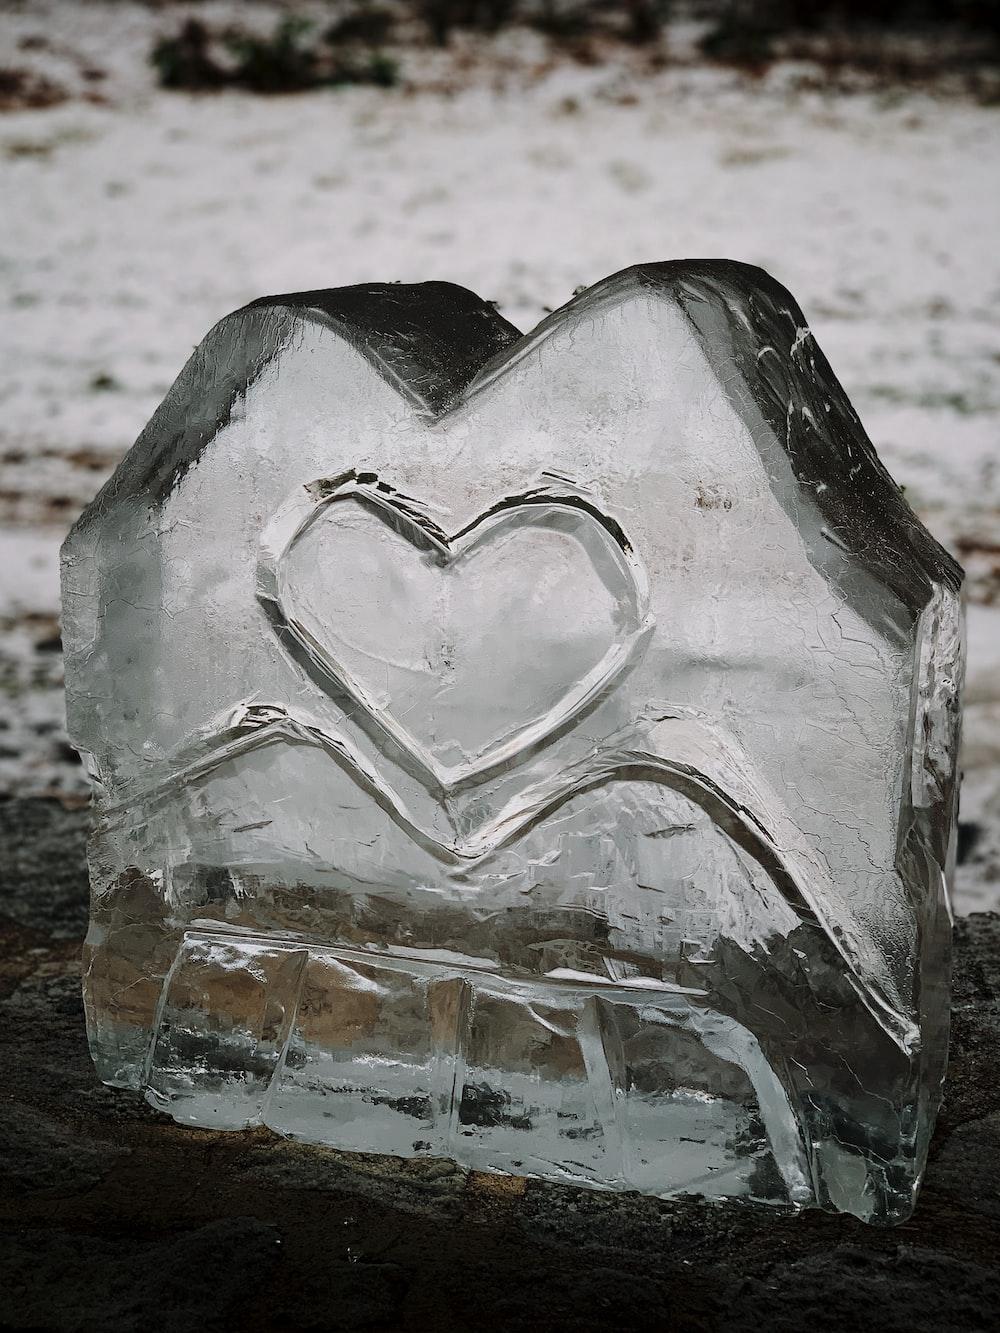 heart-themed ice block decor